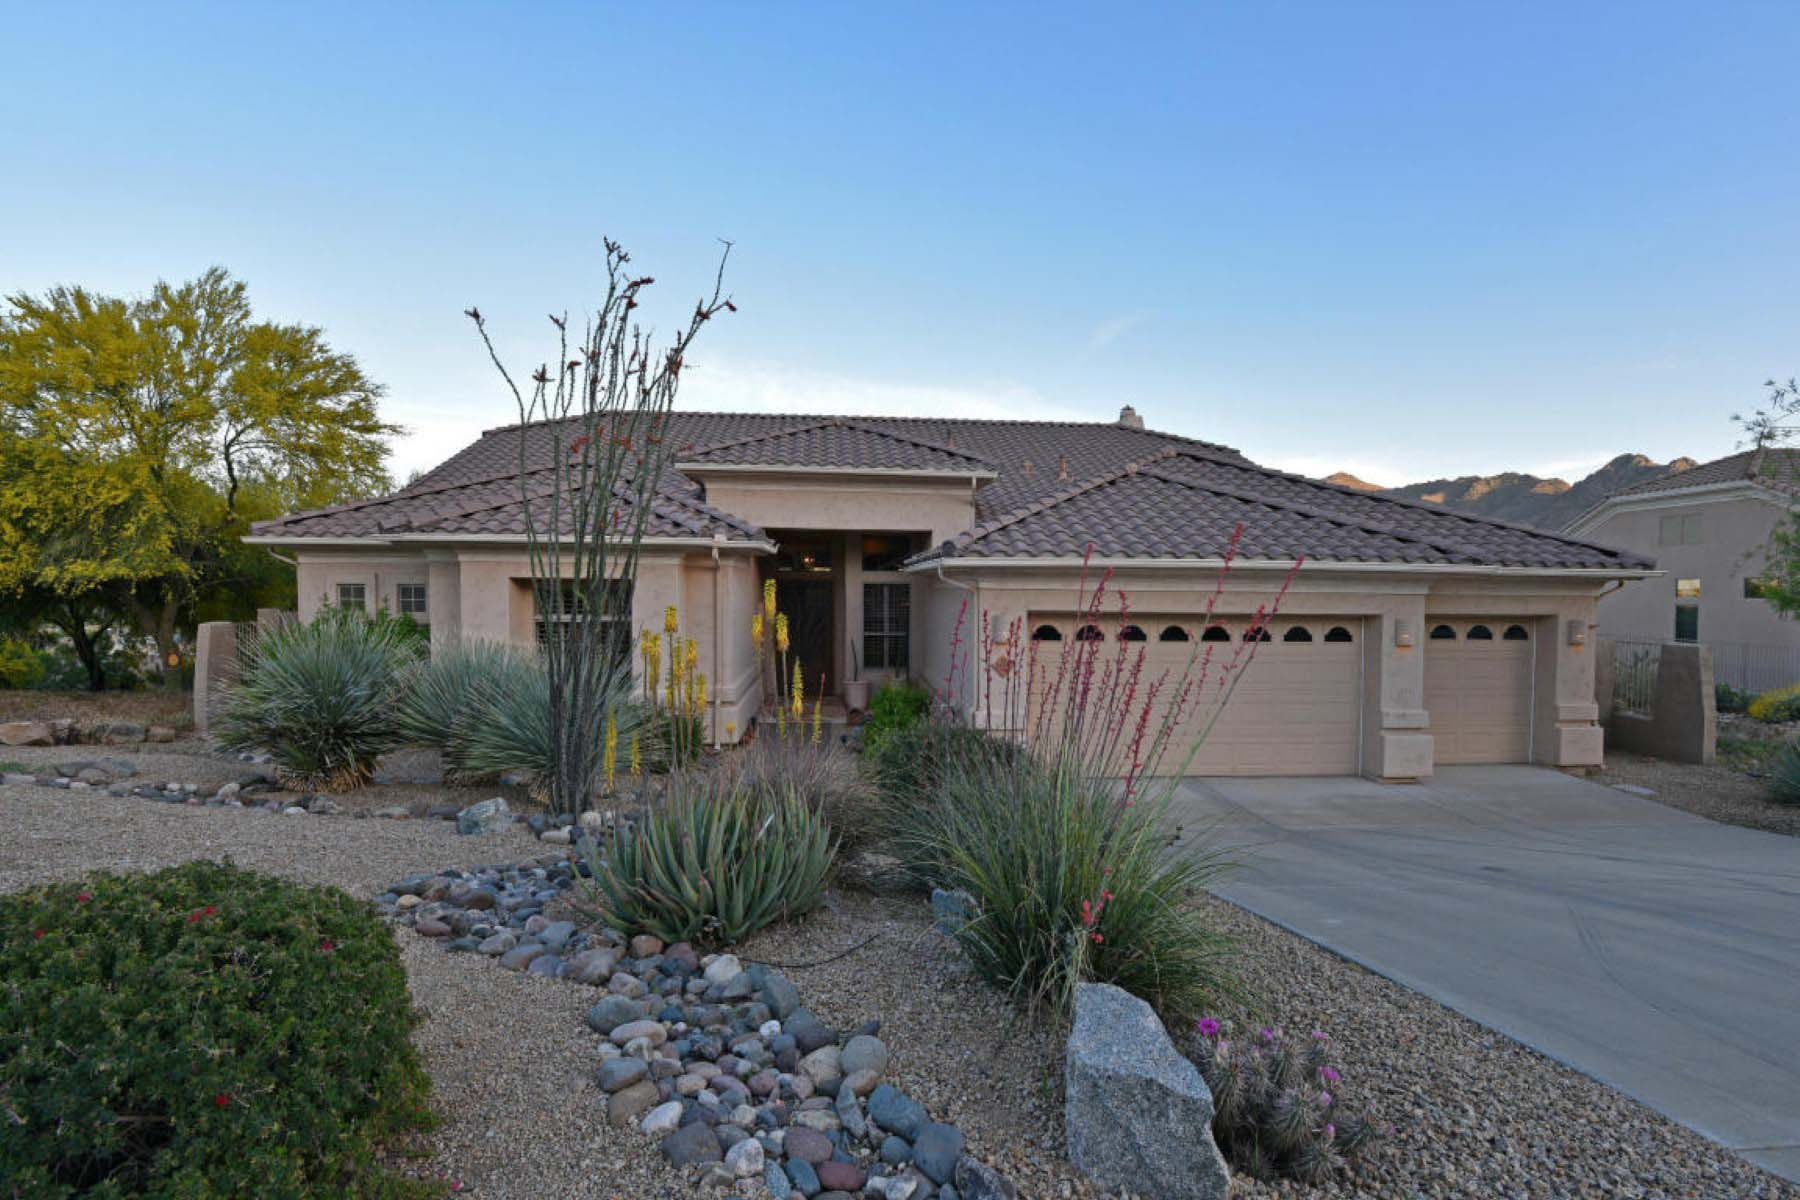 Casa para uma família para Venda às Comfortable living in this well maintained home; surrounded by mountain views. 11573 E BUCKSKIN TRL Scottsdale, Arizona 85255 Estados Unidos